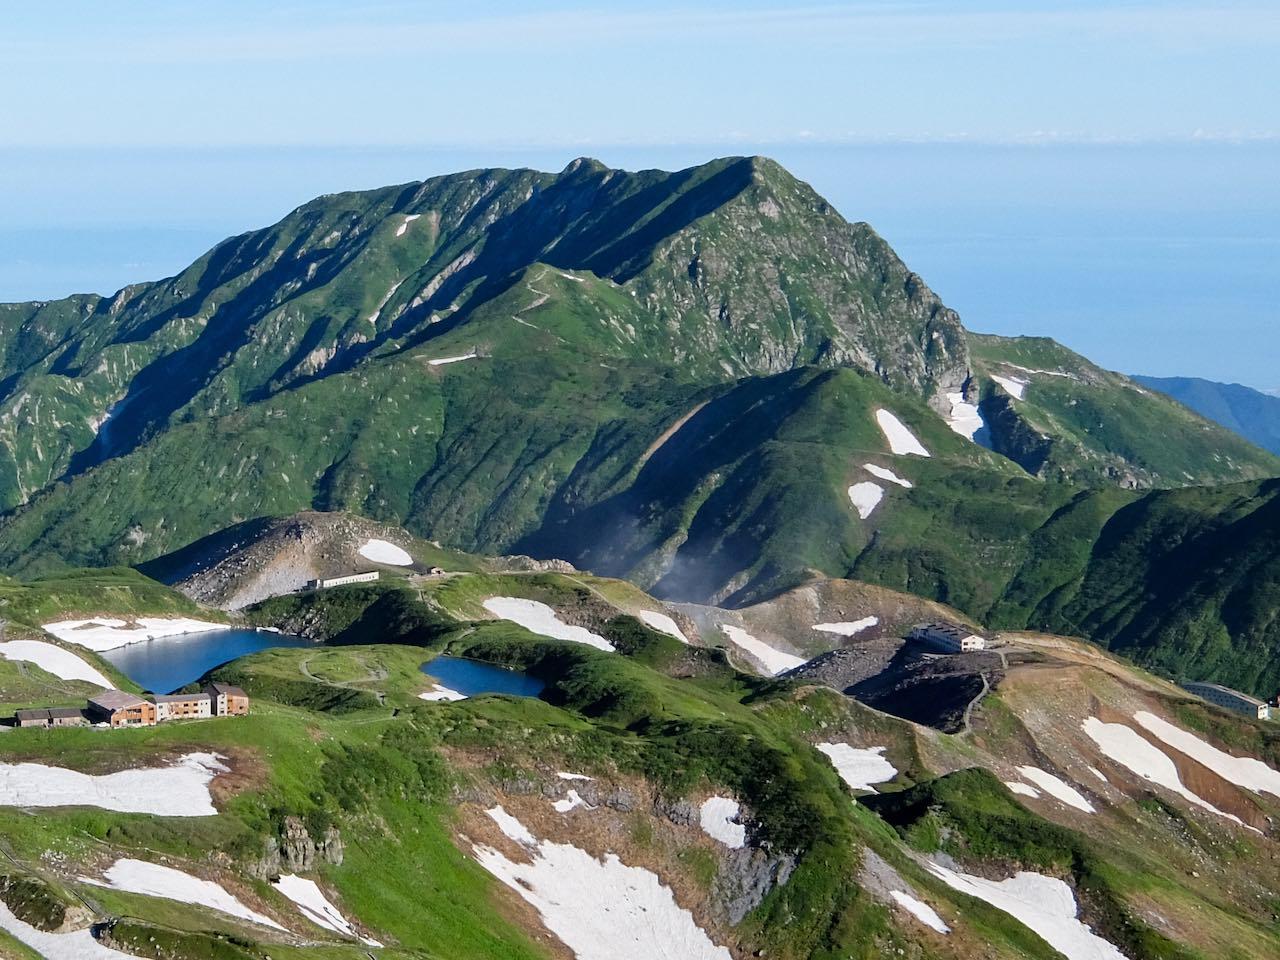 Hiking from Tateyama - Murodo